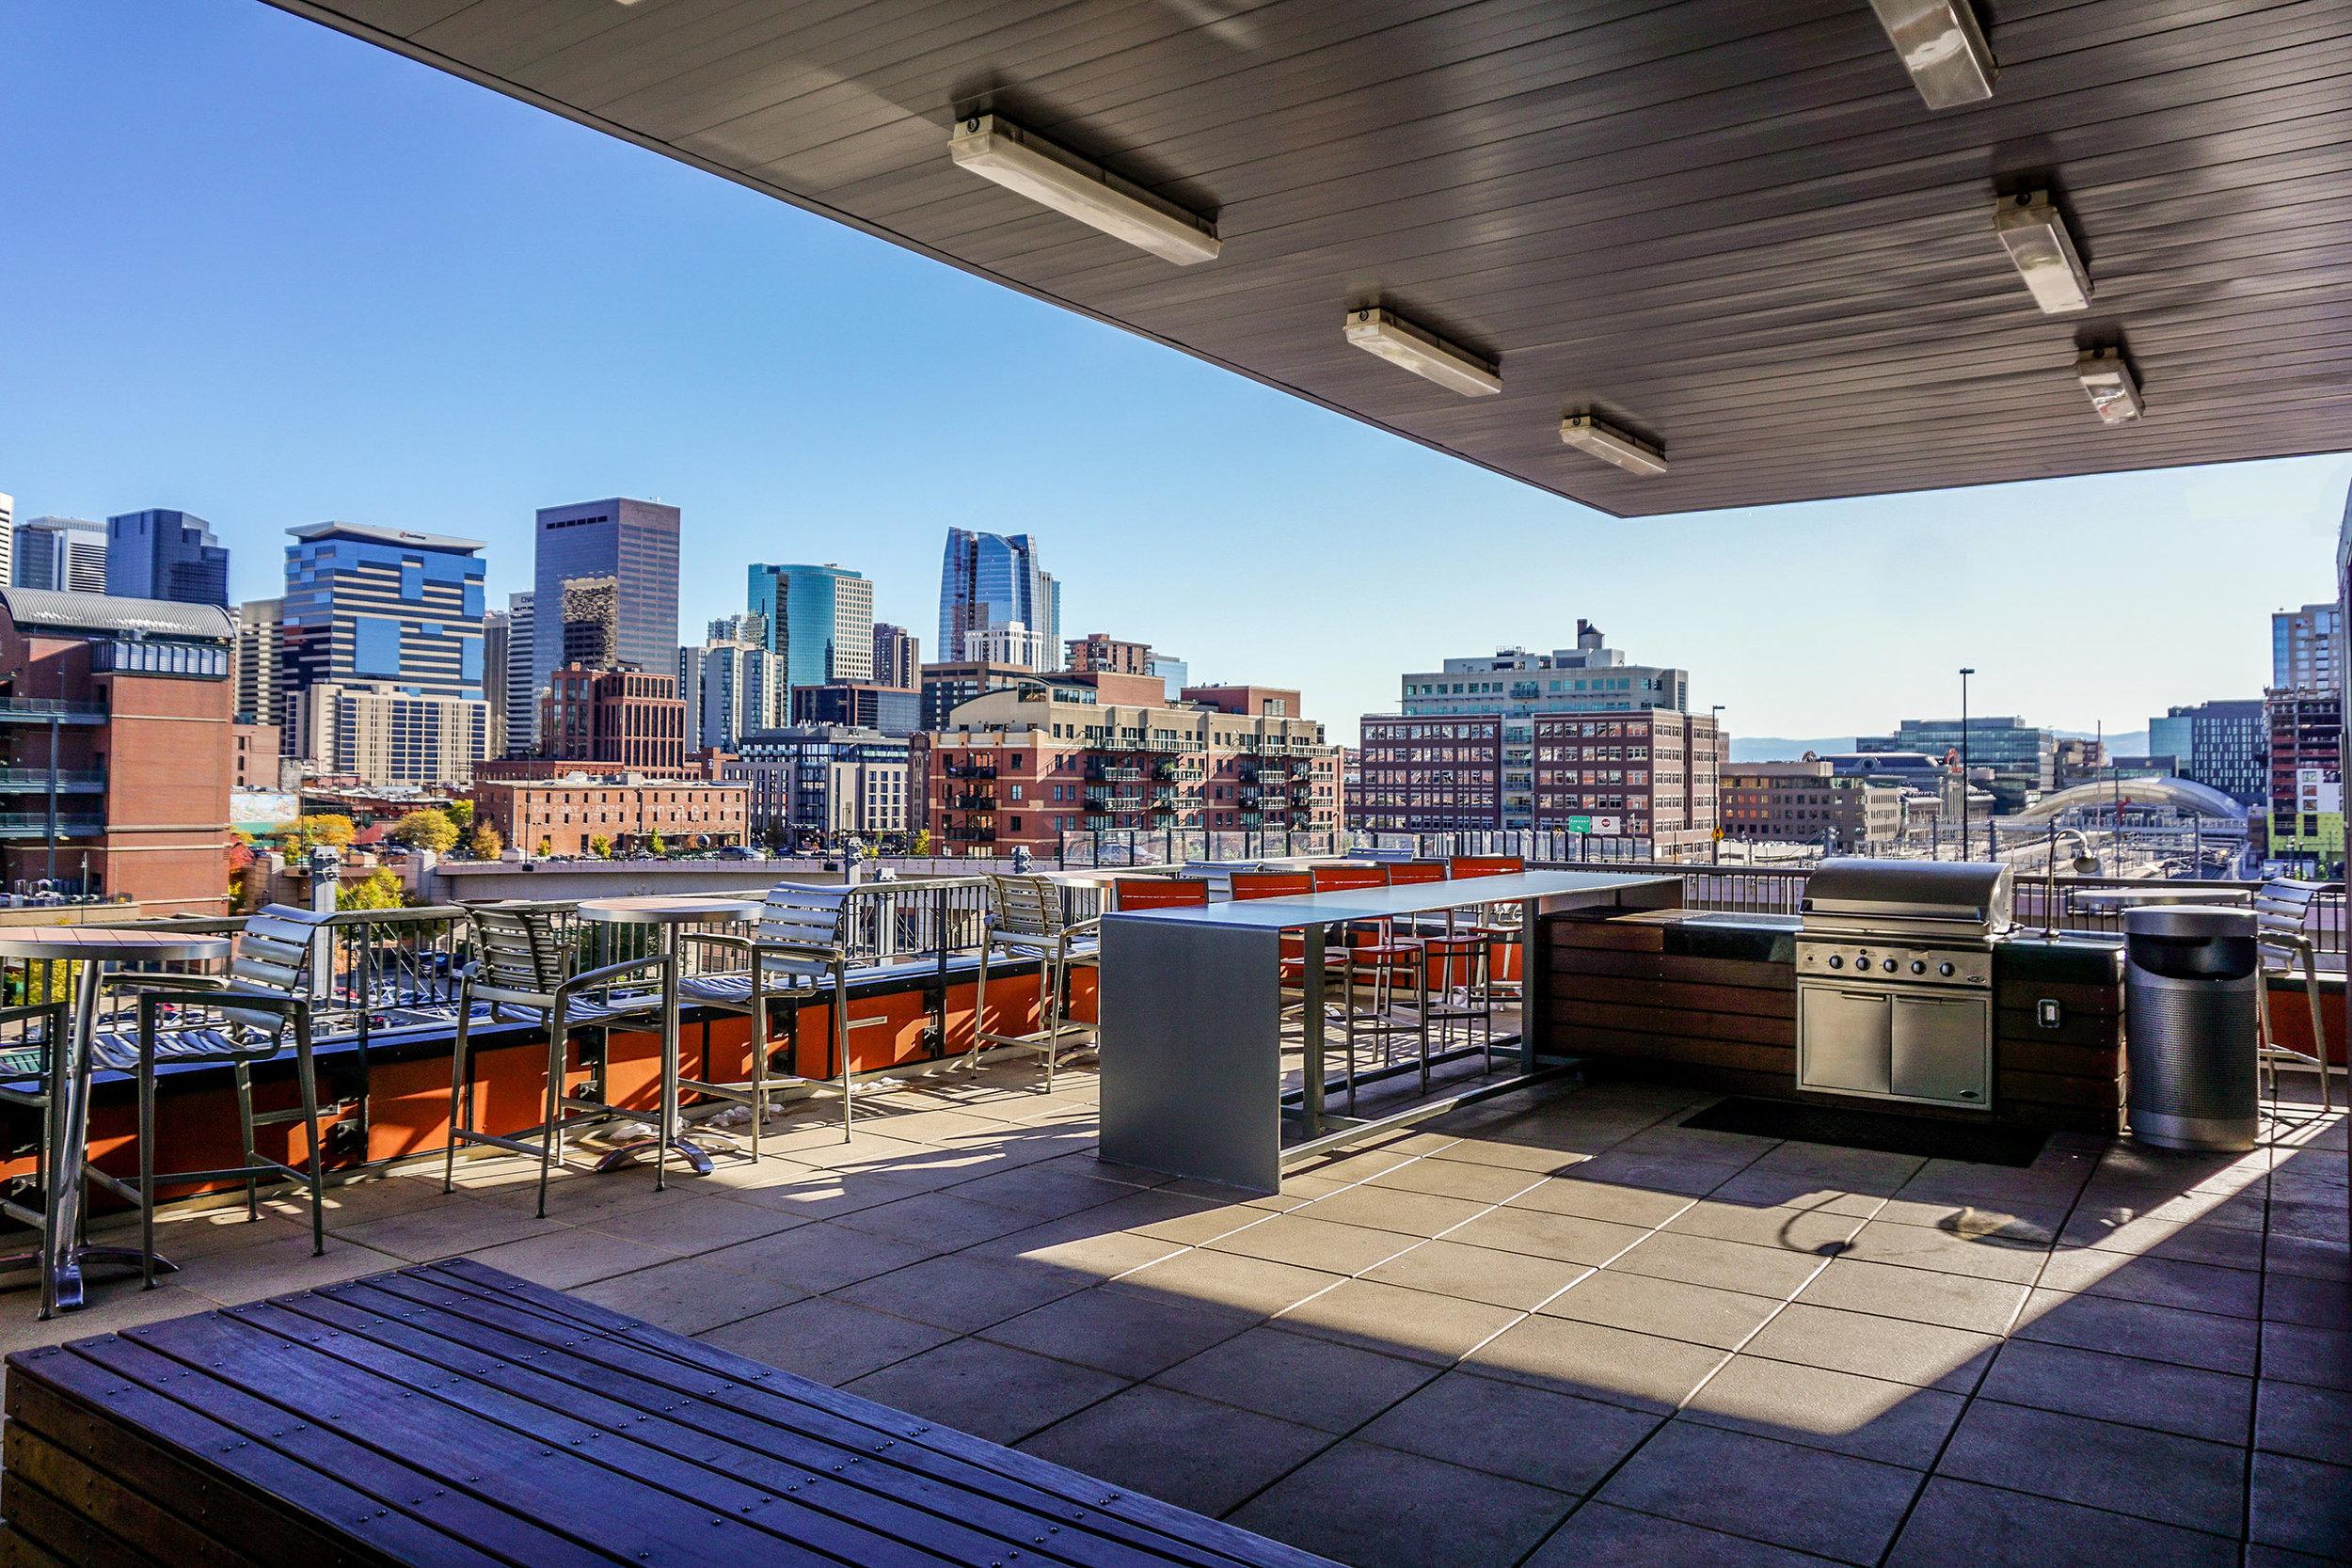 <f>Markets</f><f>Residential</f><f>Services</f><f>LandscapeArchitecture</f><t>The Casey</t><m>Denver, CO</m>